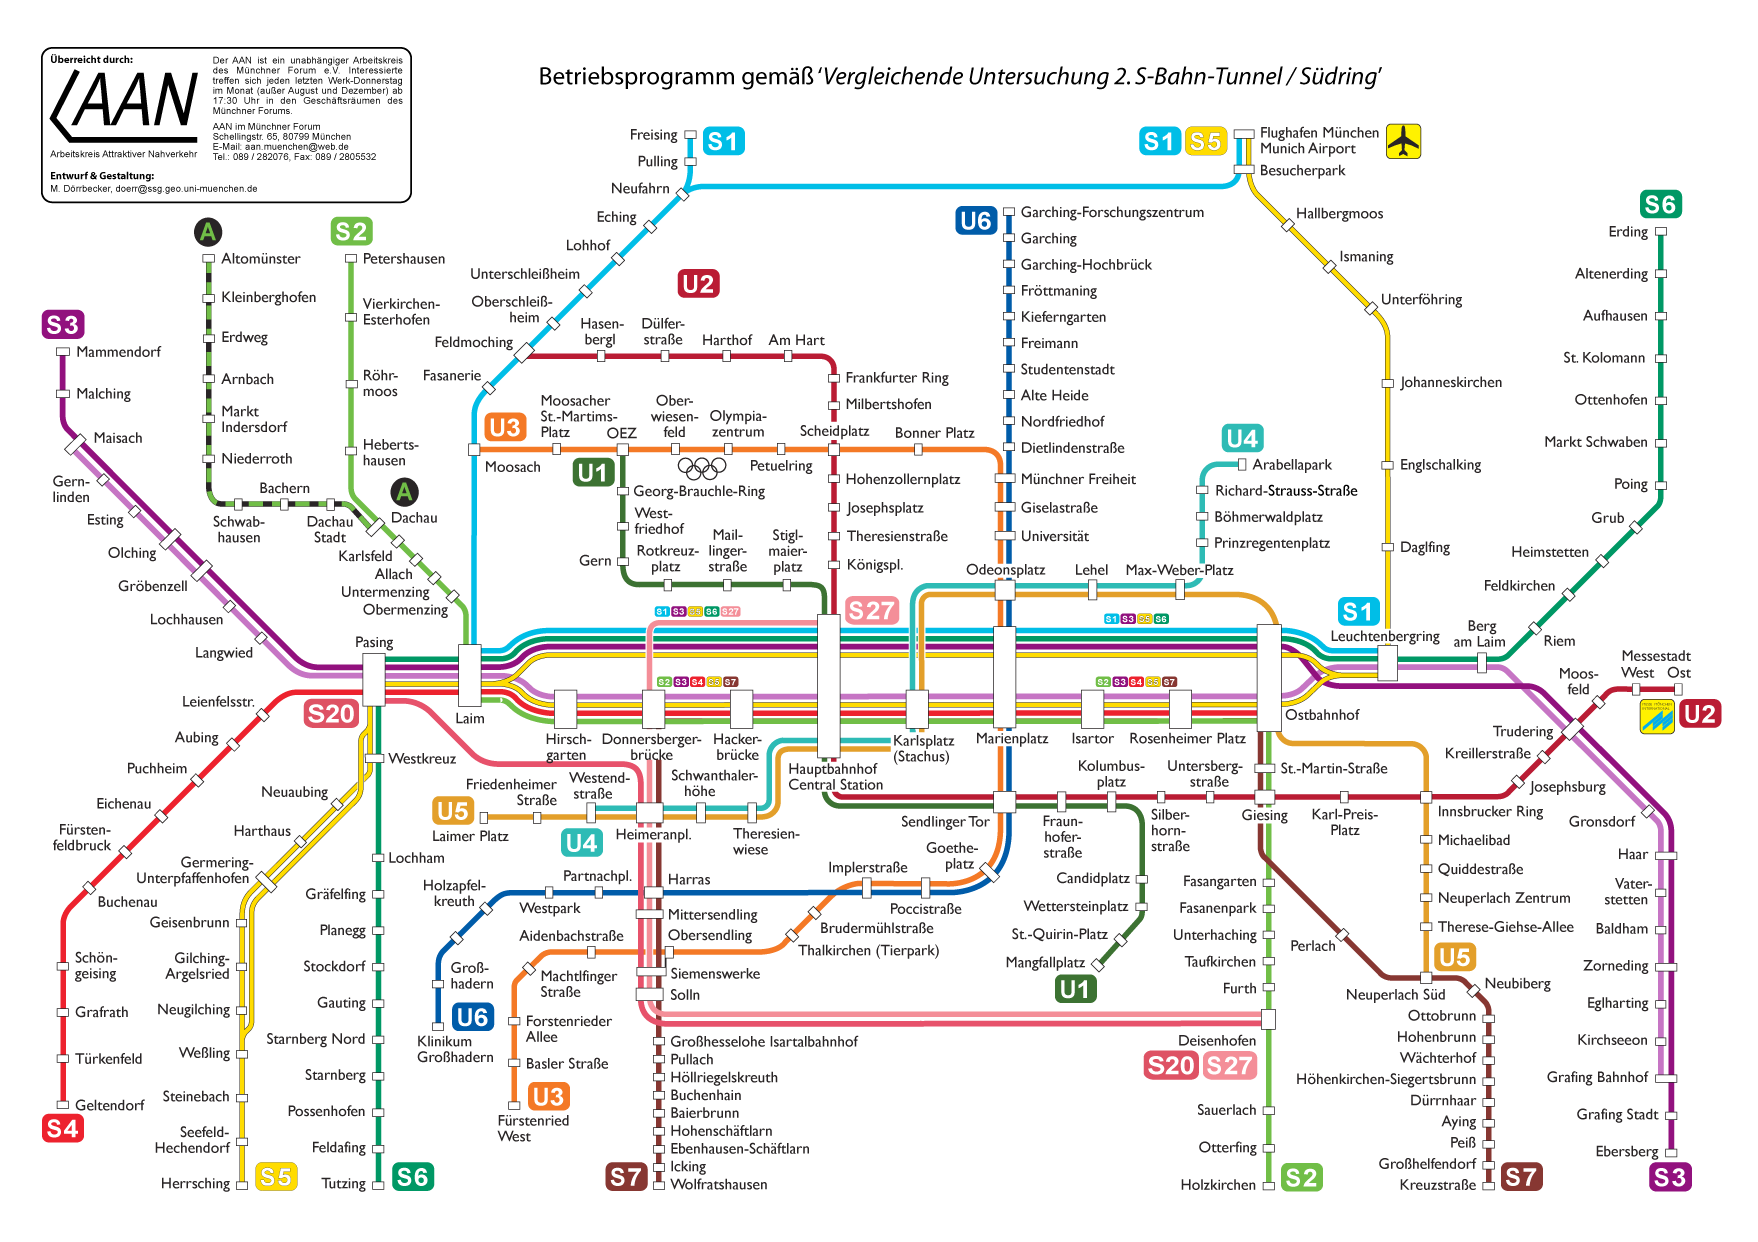 Muenchen s bahn public transport maps pinterest public transport muenchen s bahn ccuart Images